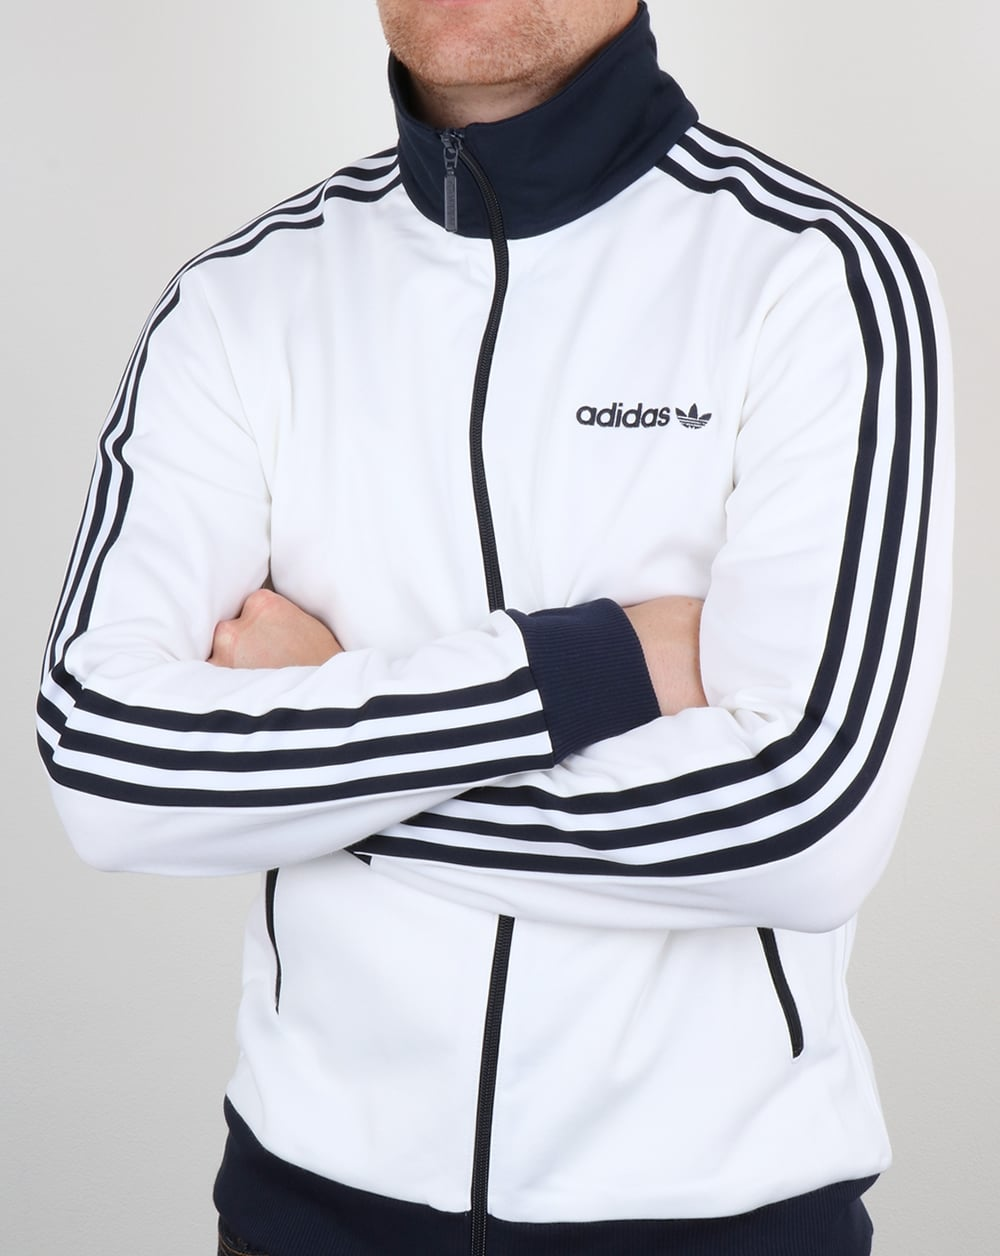 adidas originals beckenbauer white